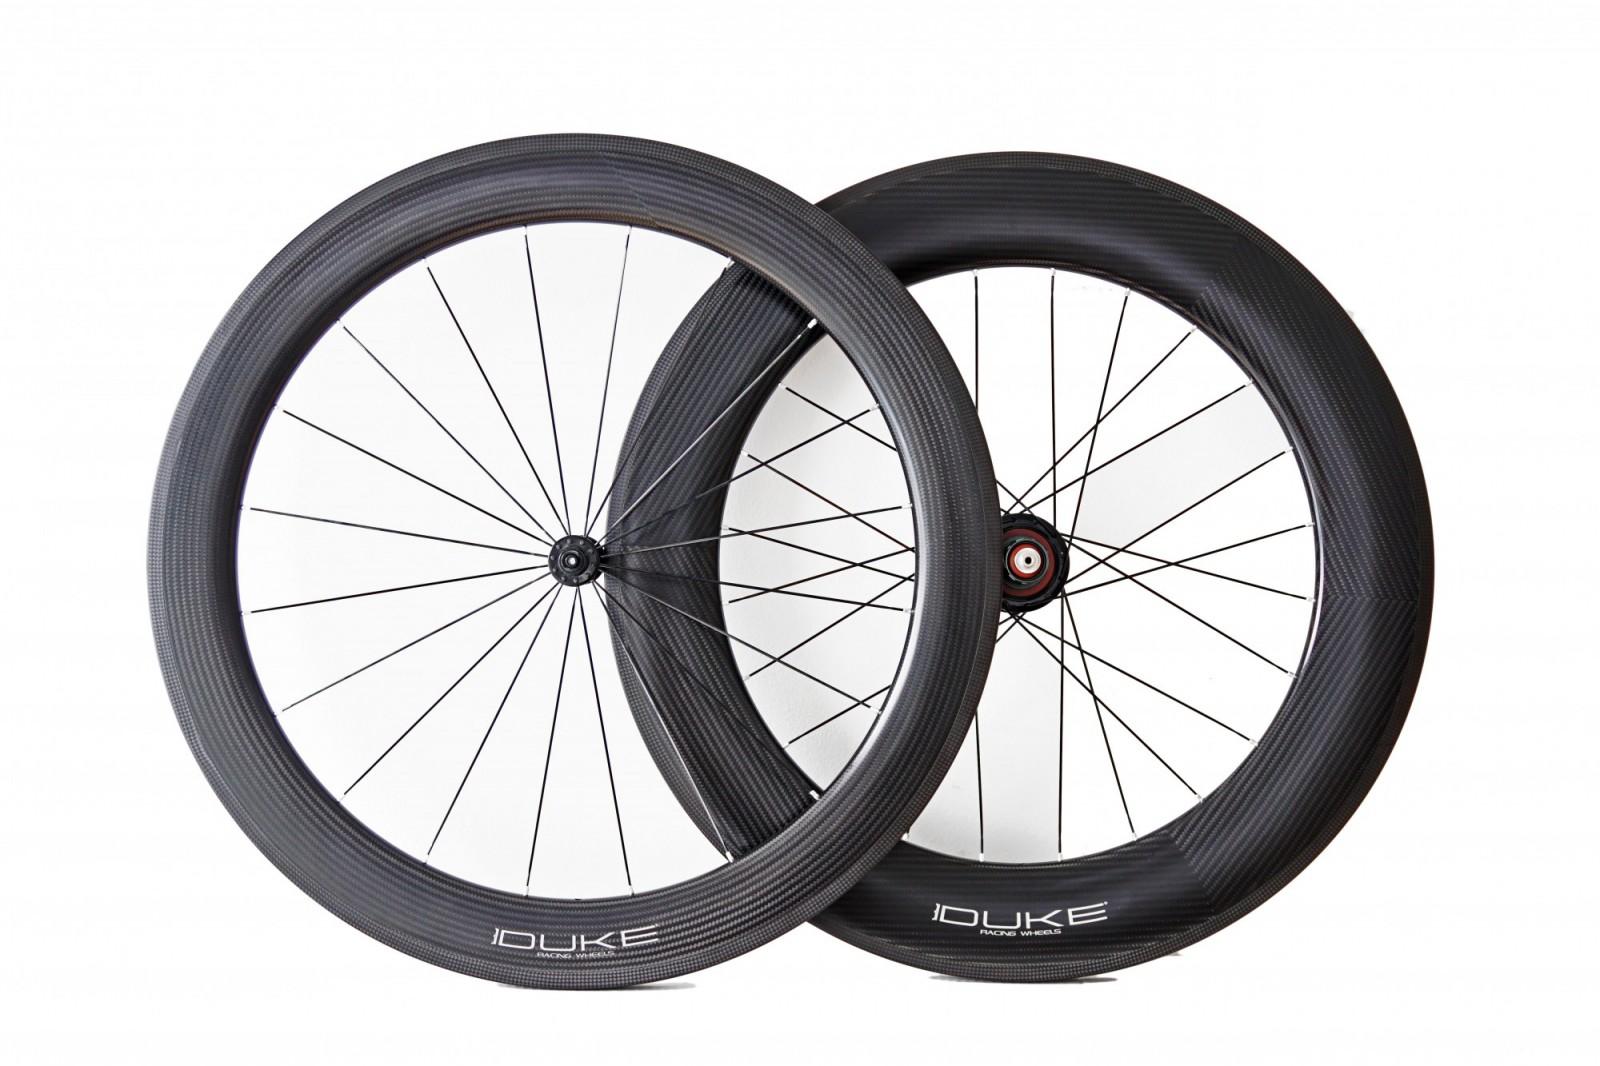 Konstructive-Tubeless-Wheel-Works-Road-Carbon-Set